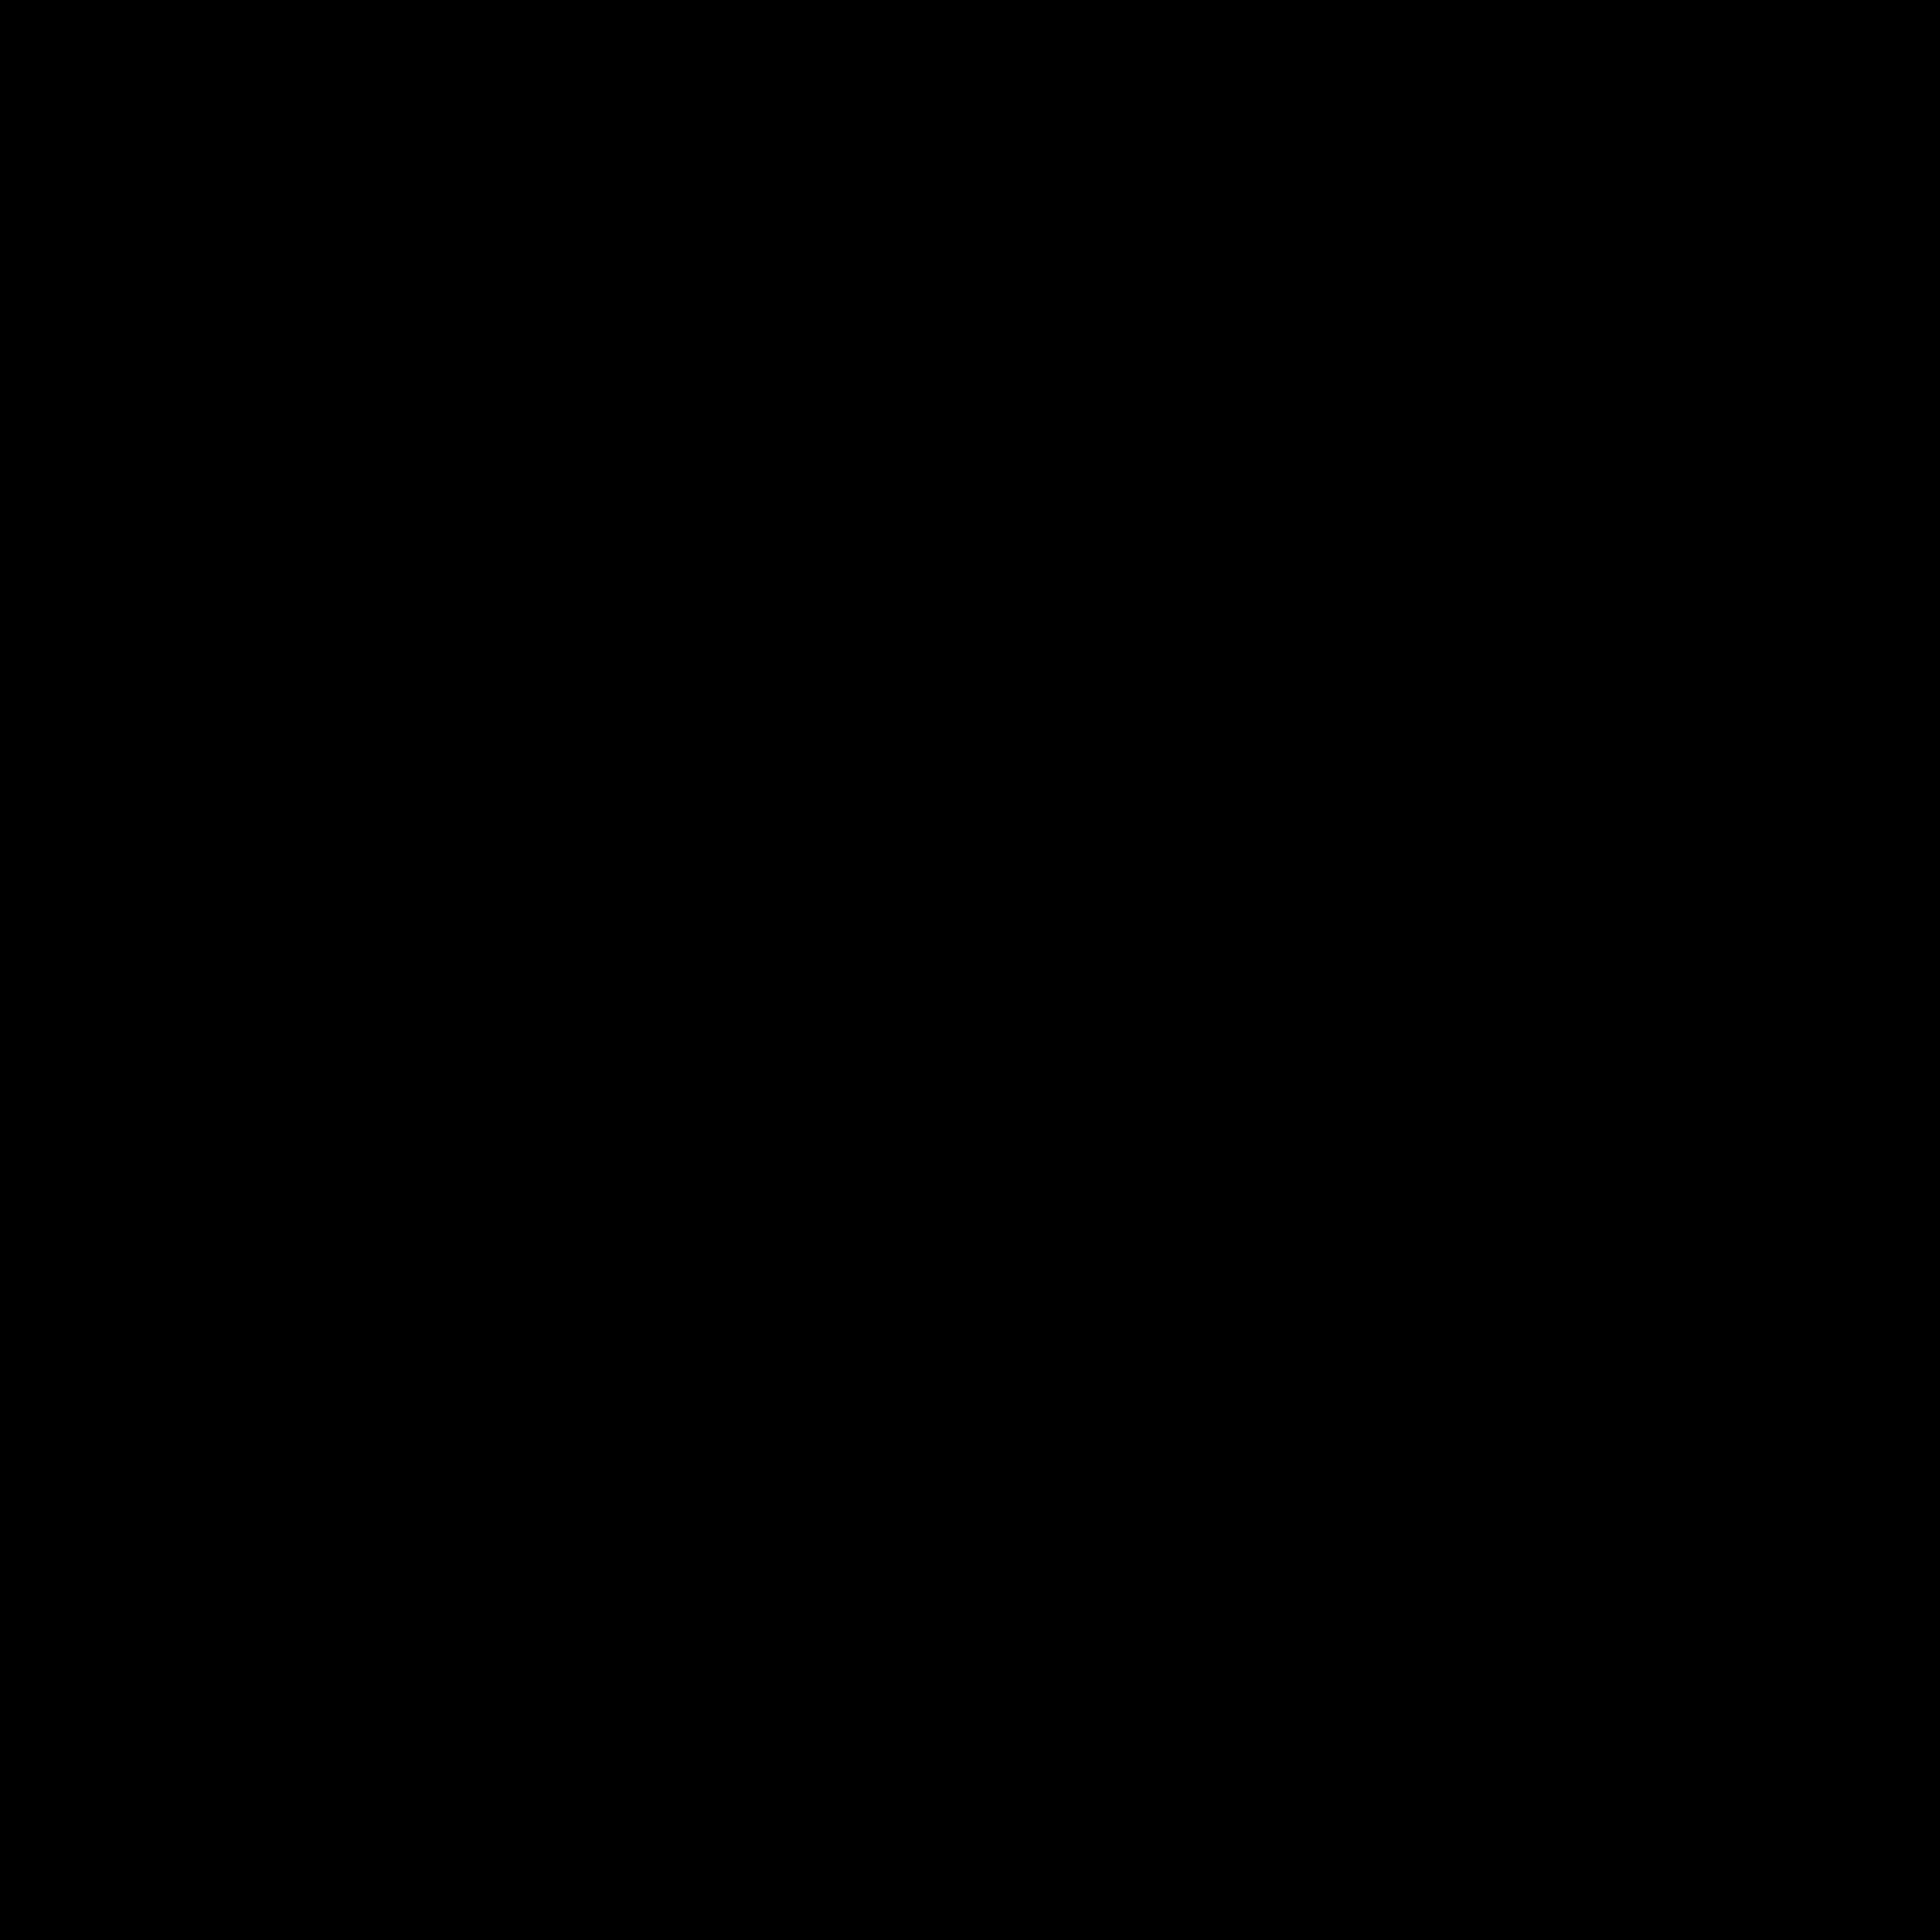 Computer Screen Clipart-computer screen clipart-9